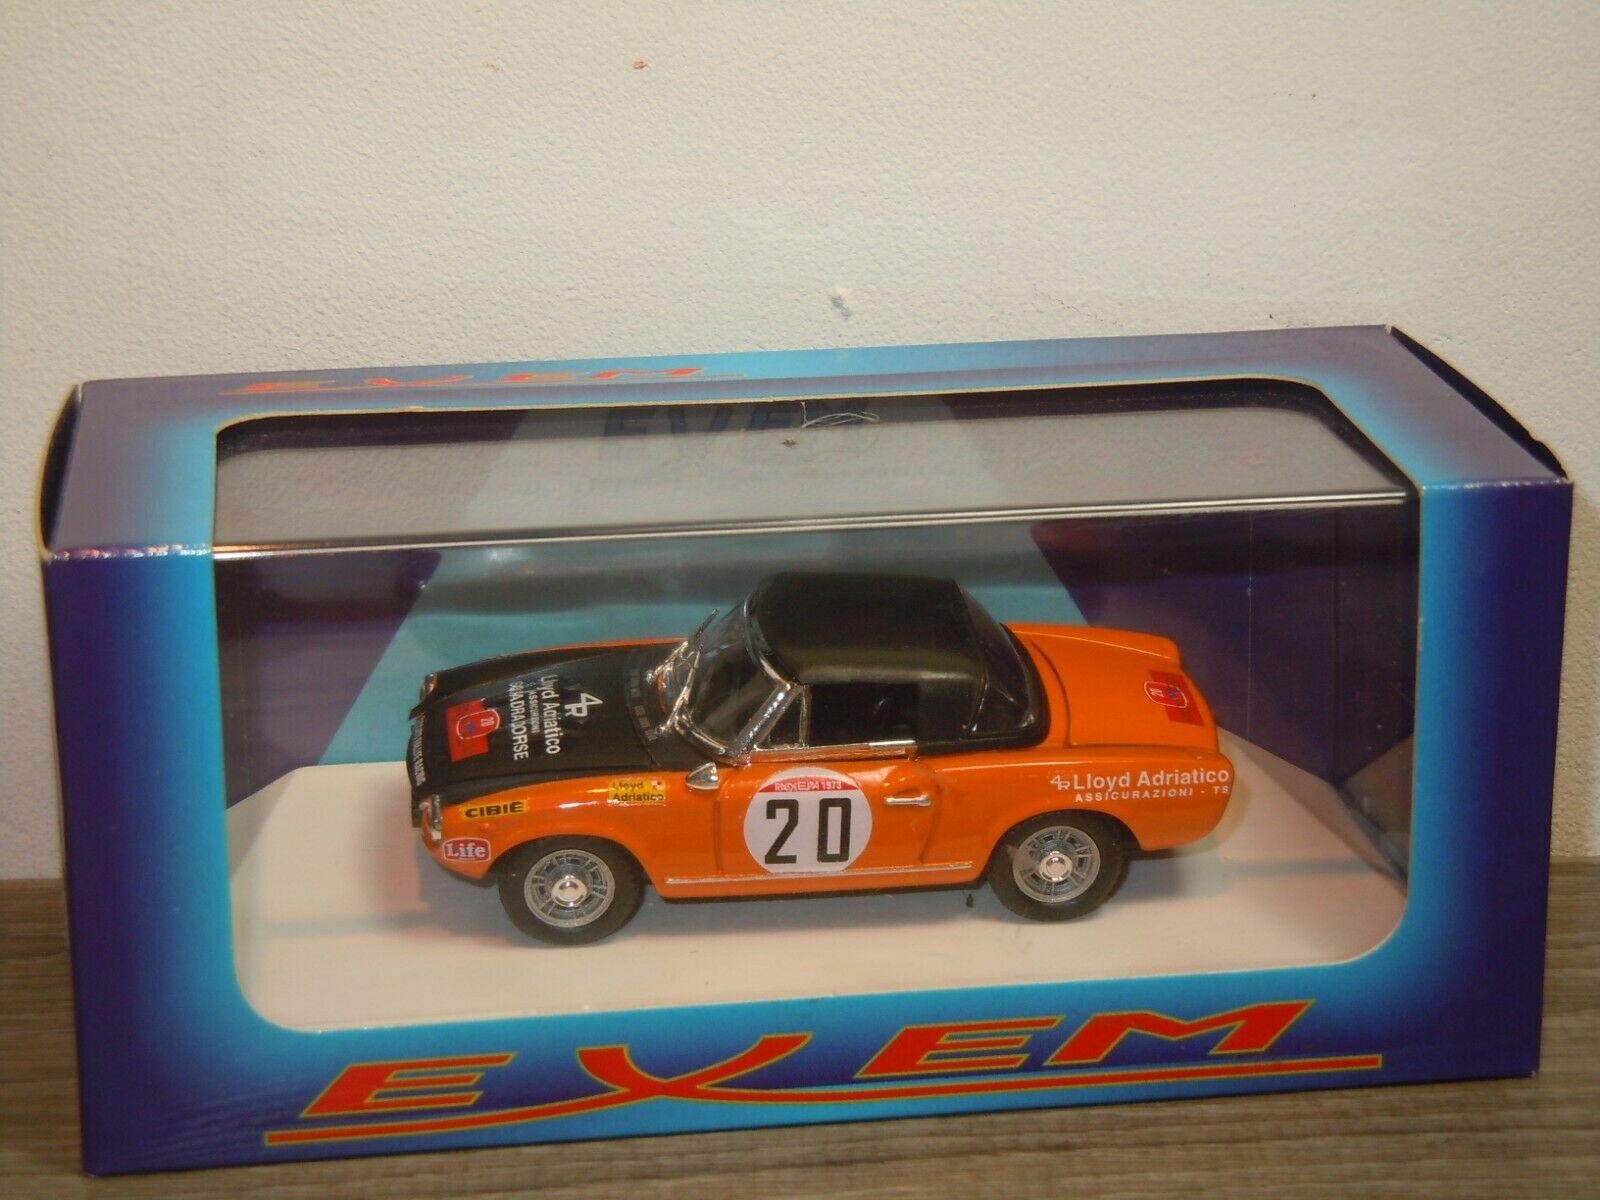 Fiat 124 Sport Spyder 1800 Rally Elba '73 - Exem EX2002  1 43 in Box 37211